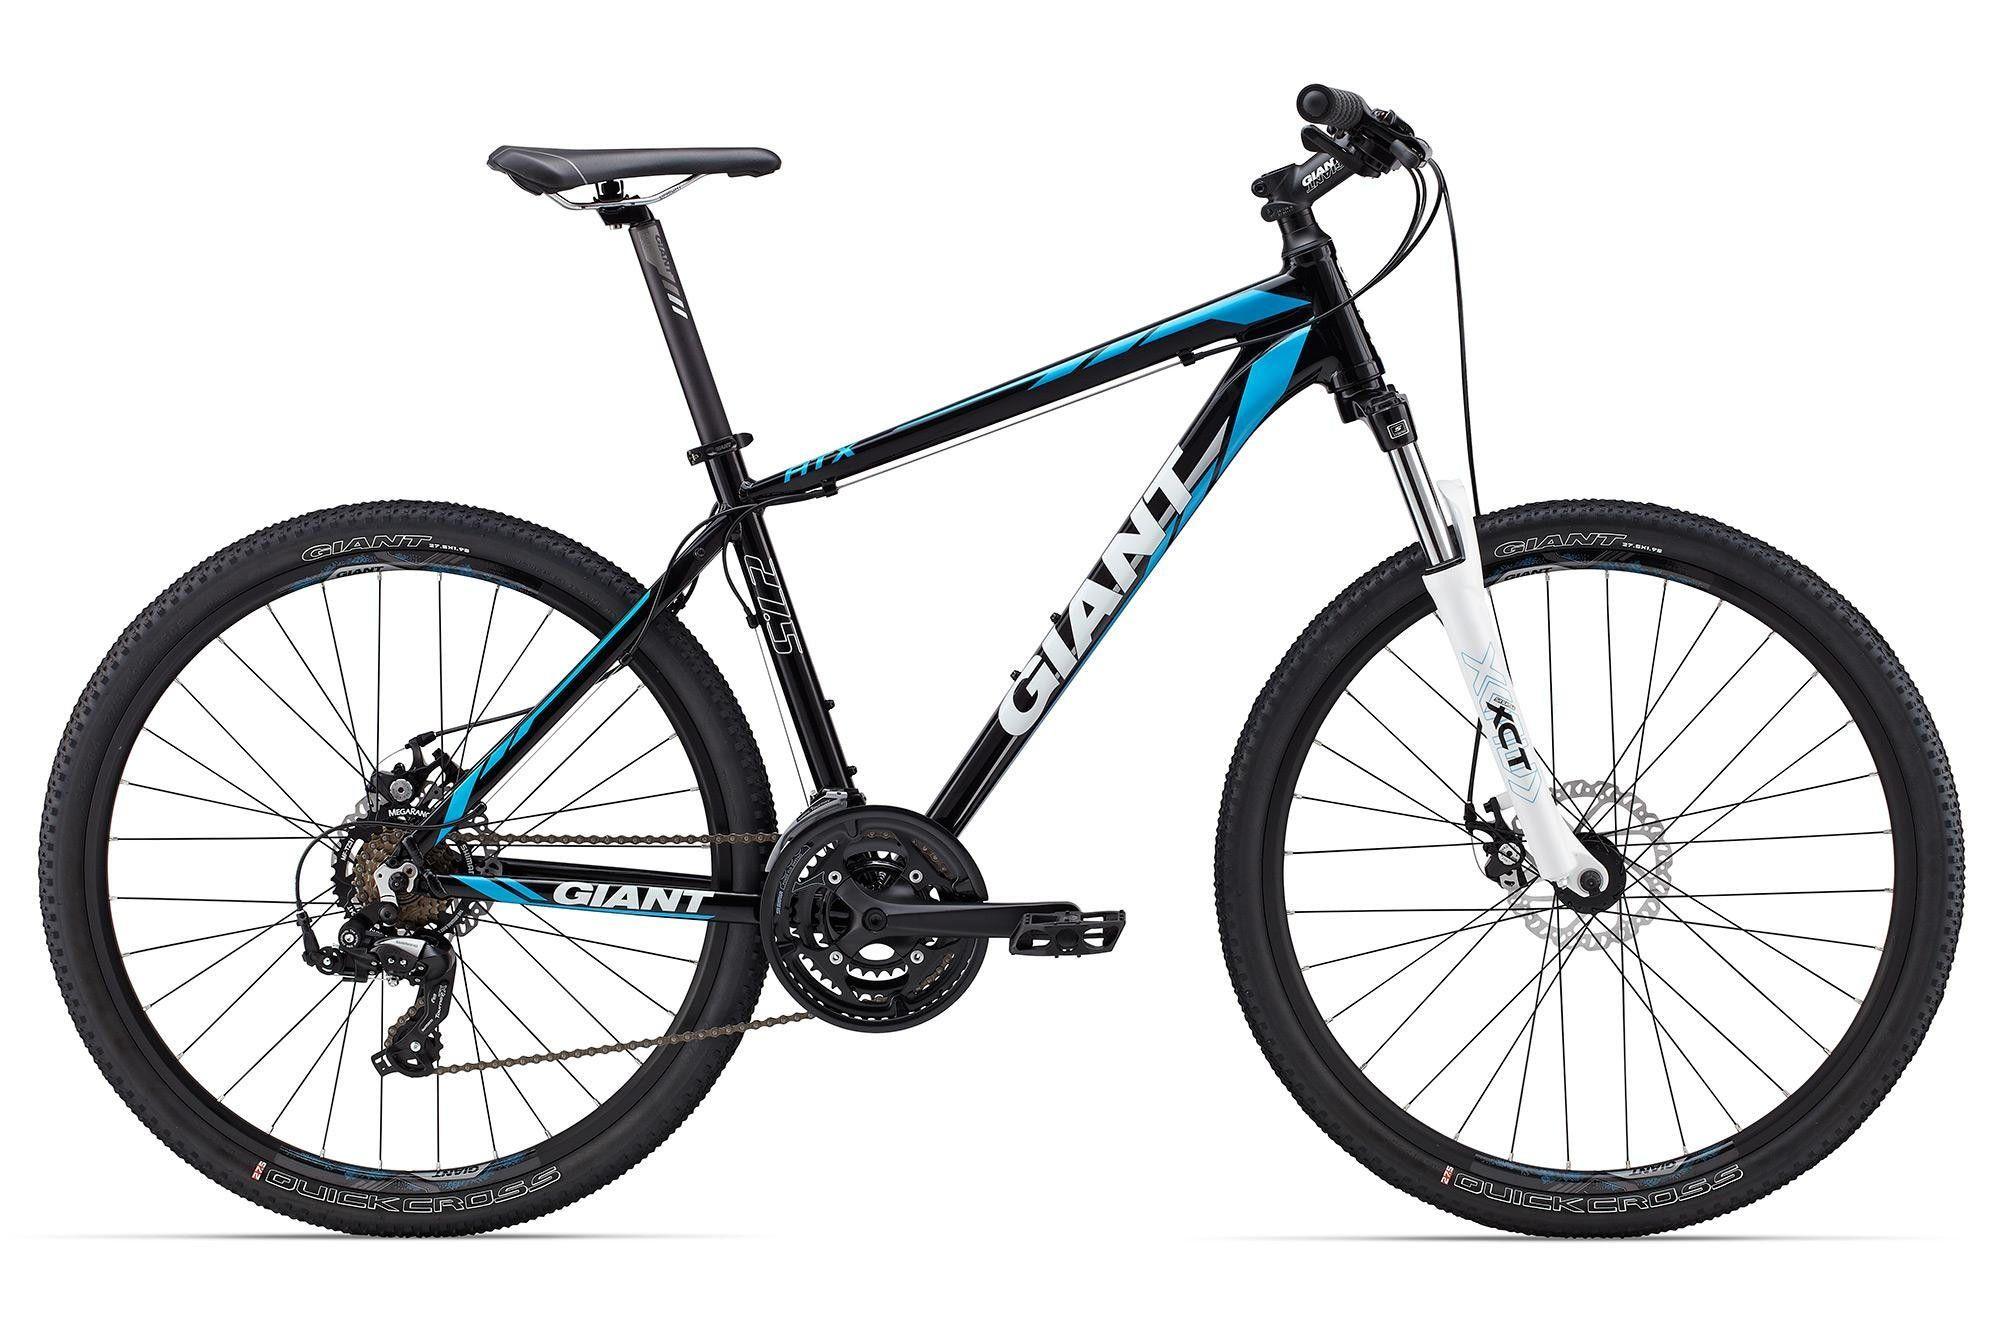 7b326fc1ec3 Giant Atx 27.5 2 Mens Cycle   Xmas 2016   Hardtail mountain bike ...